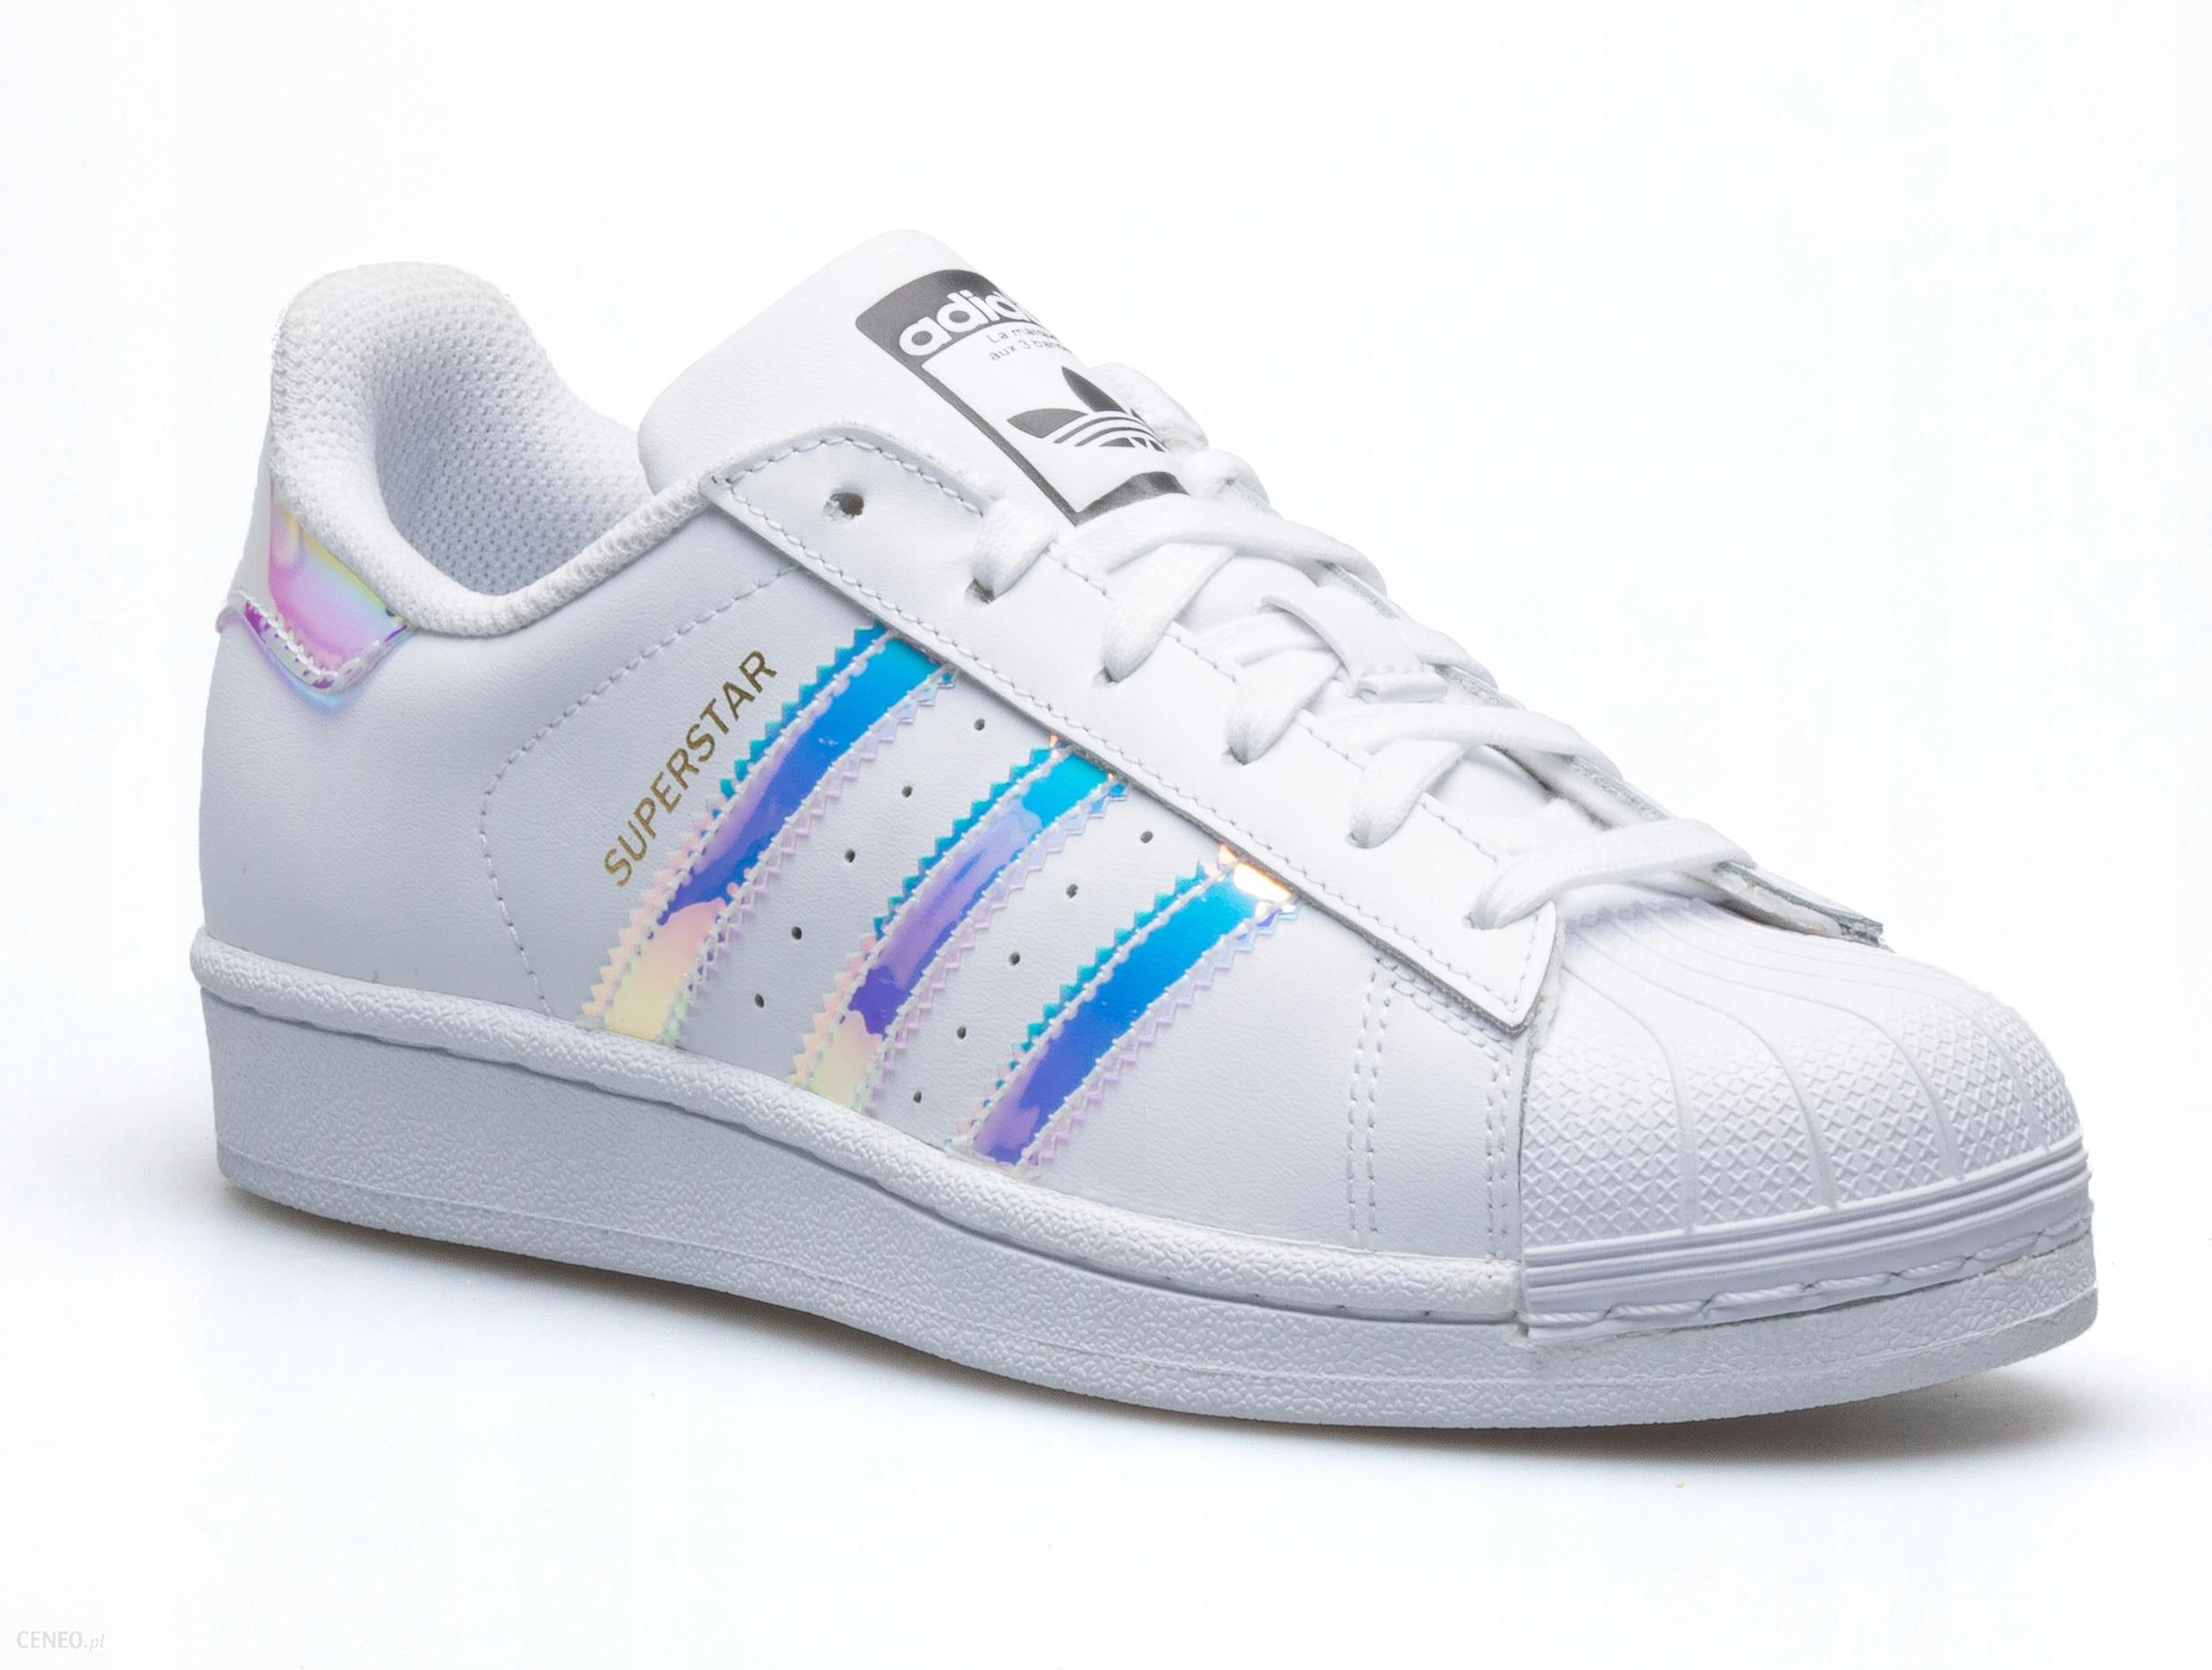 Adidas Superstar 38 oferty 2019 Ceneo.pl